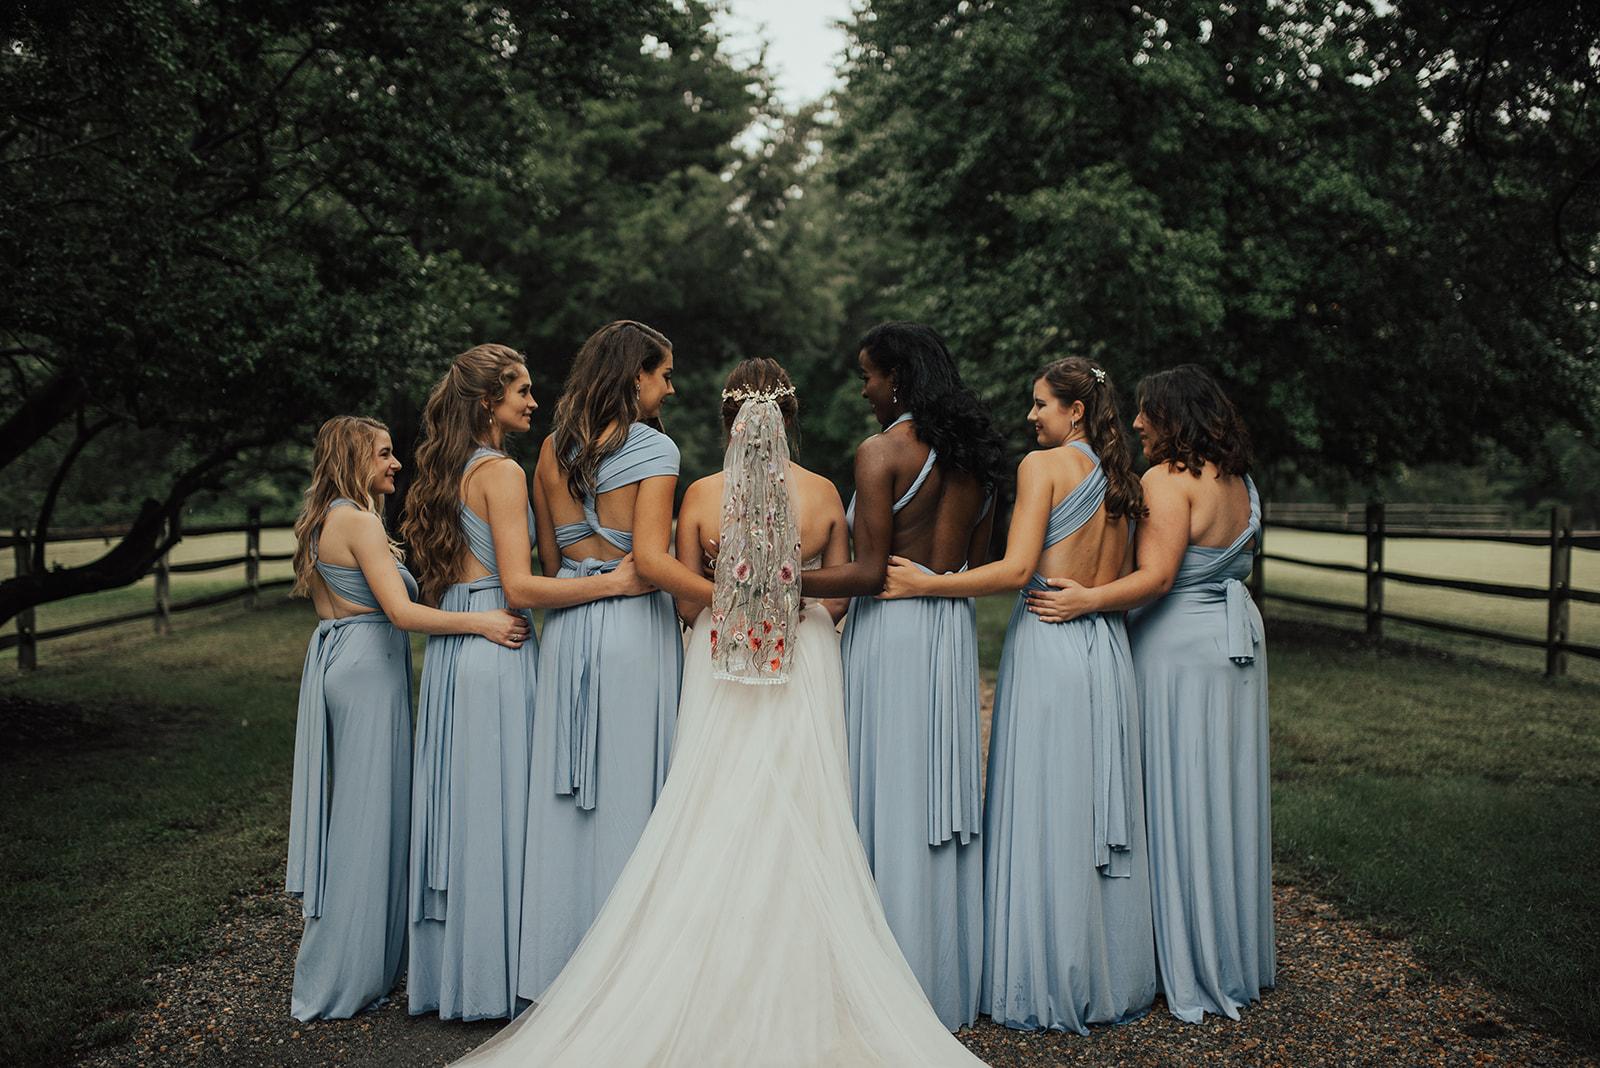 Richmond Wedding By SB Photographs129129129129.jpg